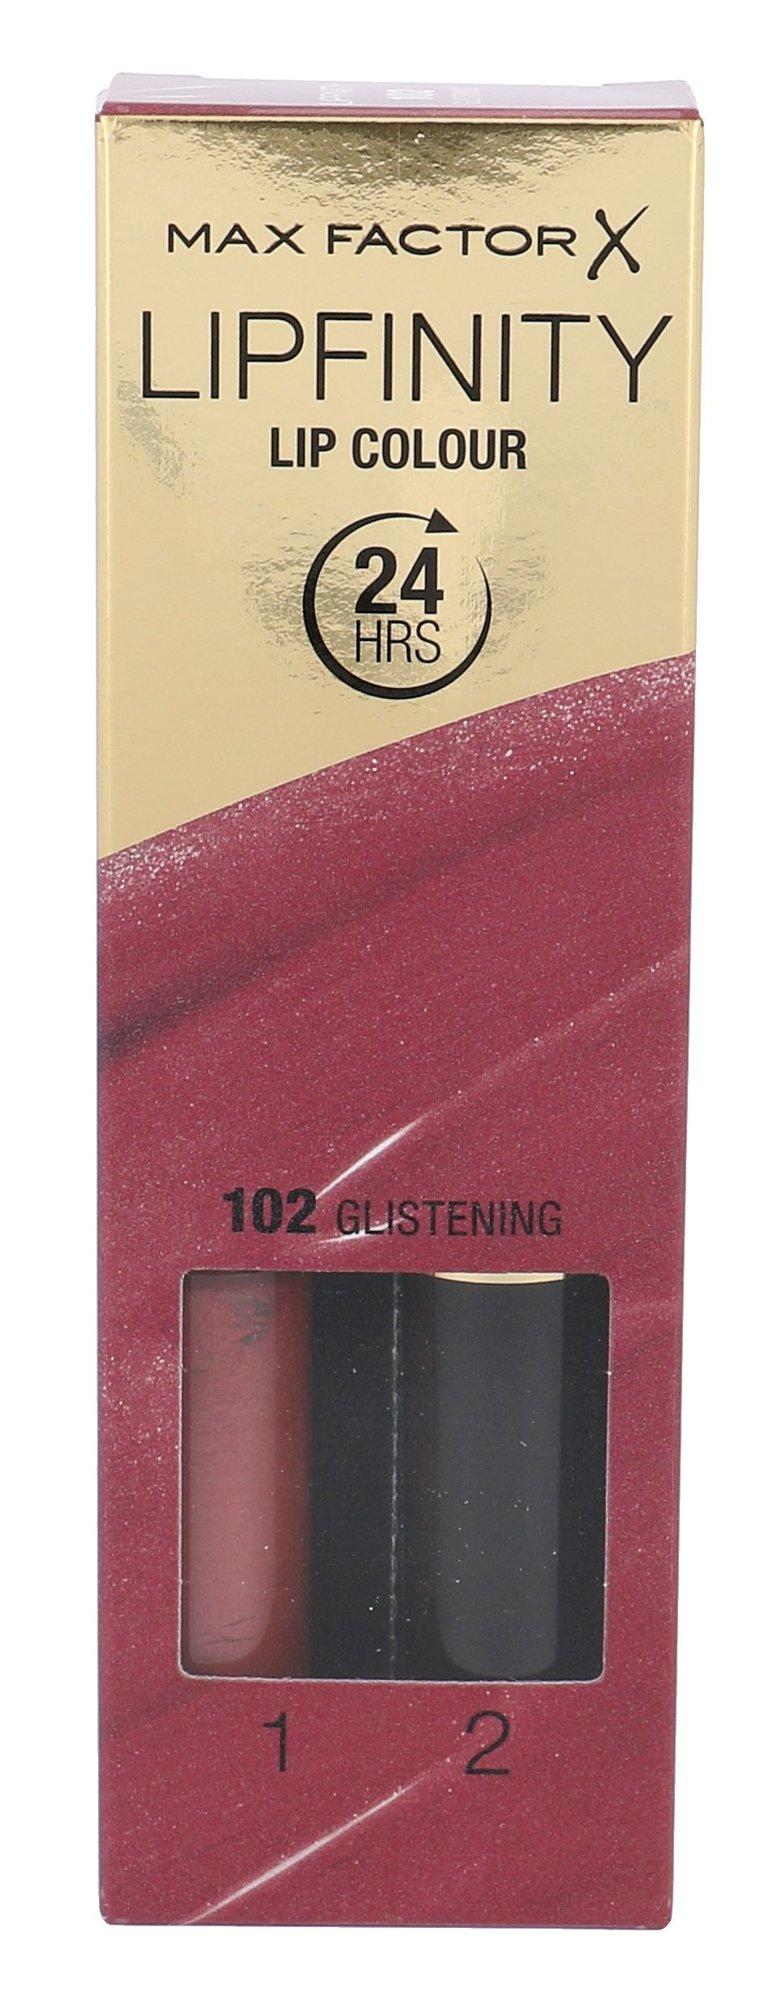 Max Factor Lipfinity Cosmetic 4,2ml 102 Glistening